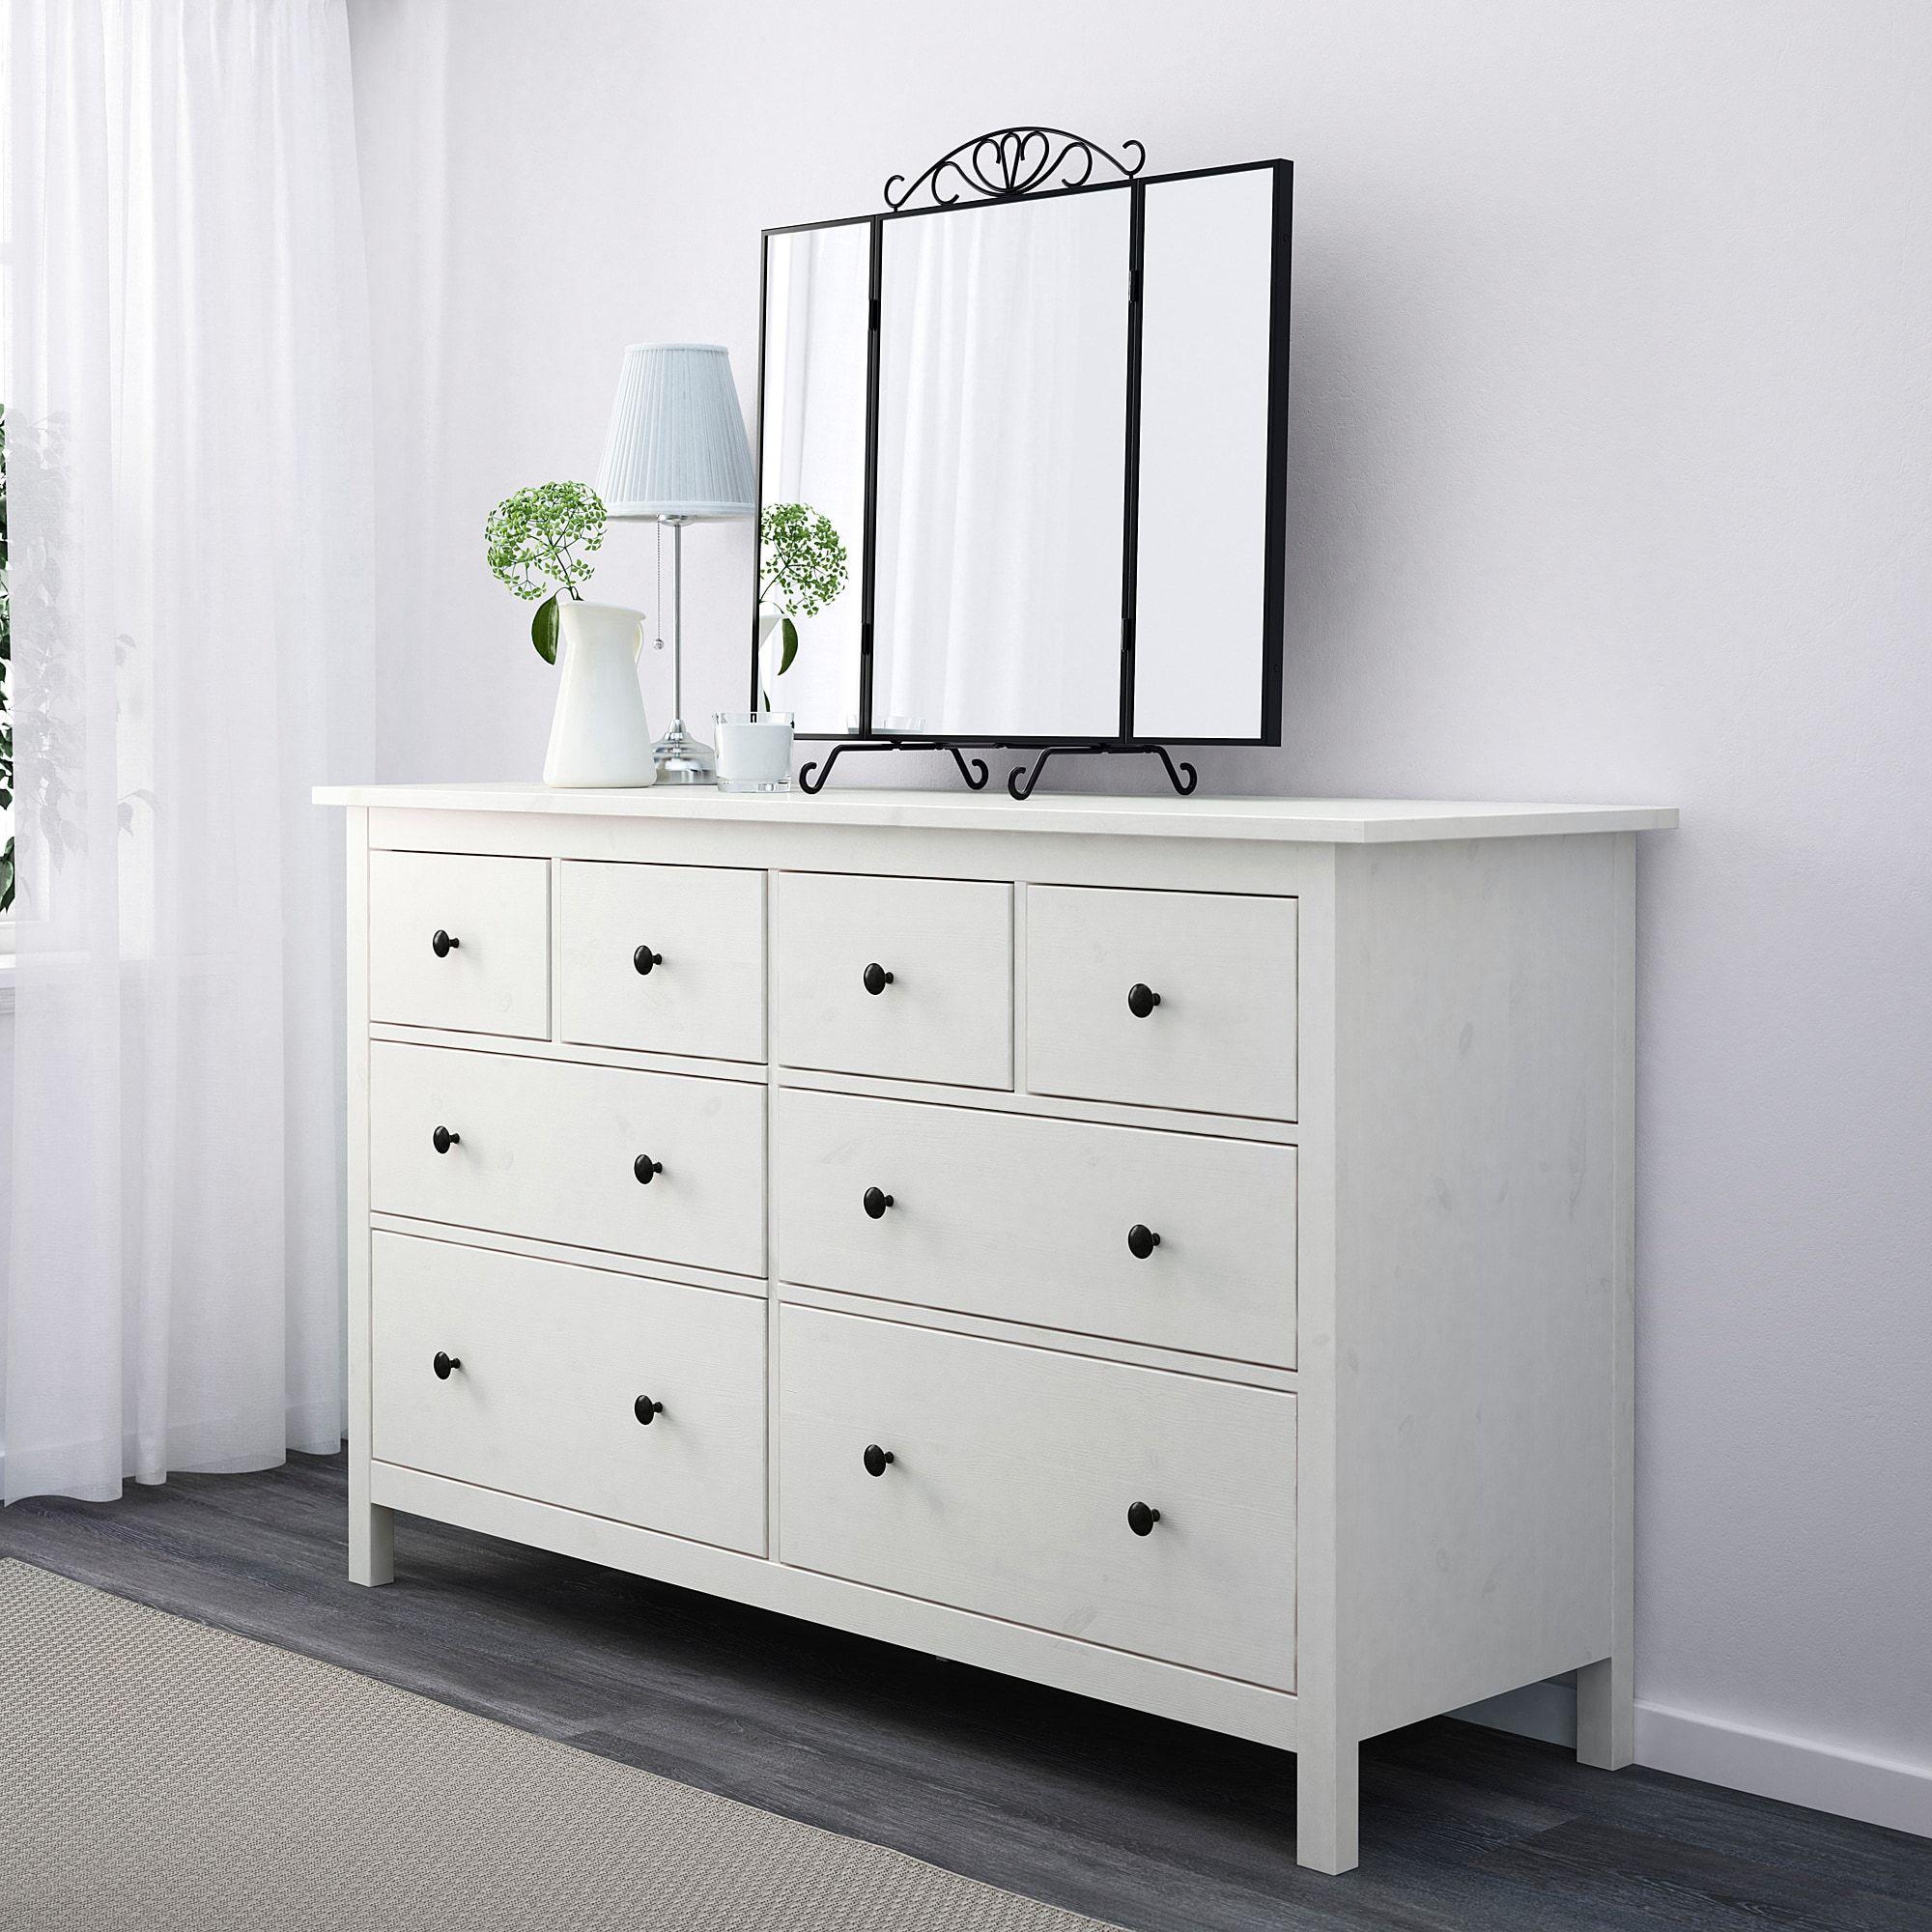 Hemnes Commode 8 Tiroirs Teinte Blanc 160x96 Cm Ikea 8 Drawer Dresser Ikea Hemnes Dresser White Dresser With Mirror [ 2000 x 2000 Pixel ]